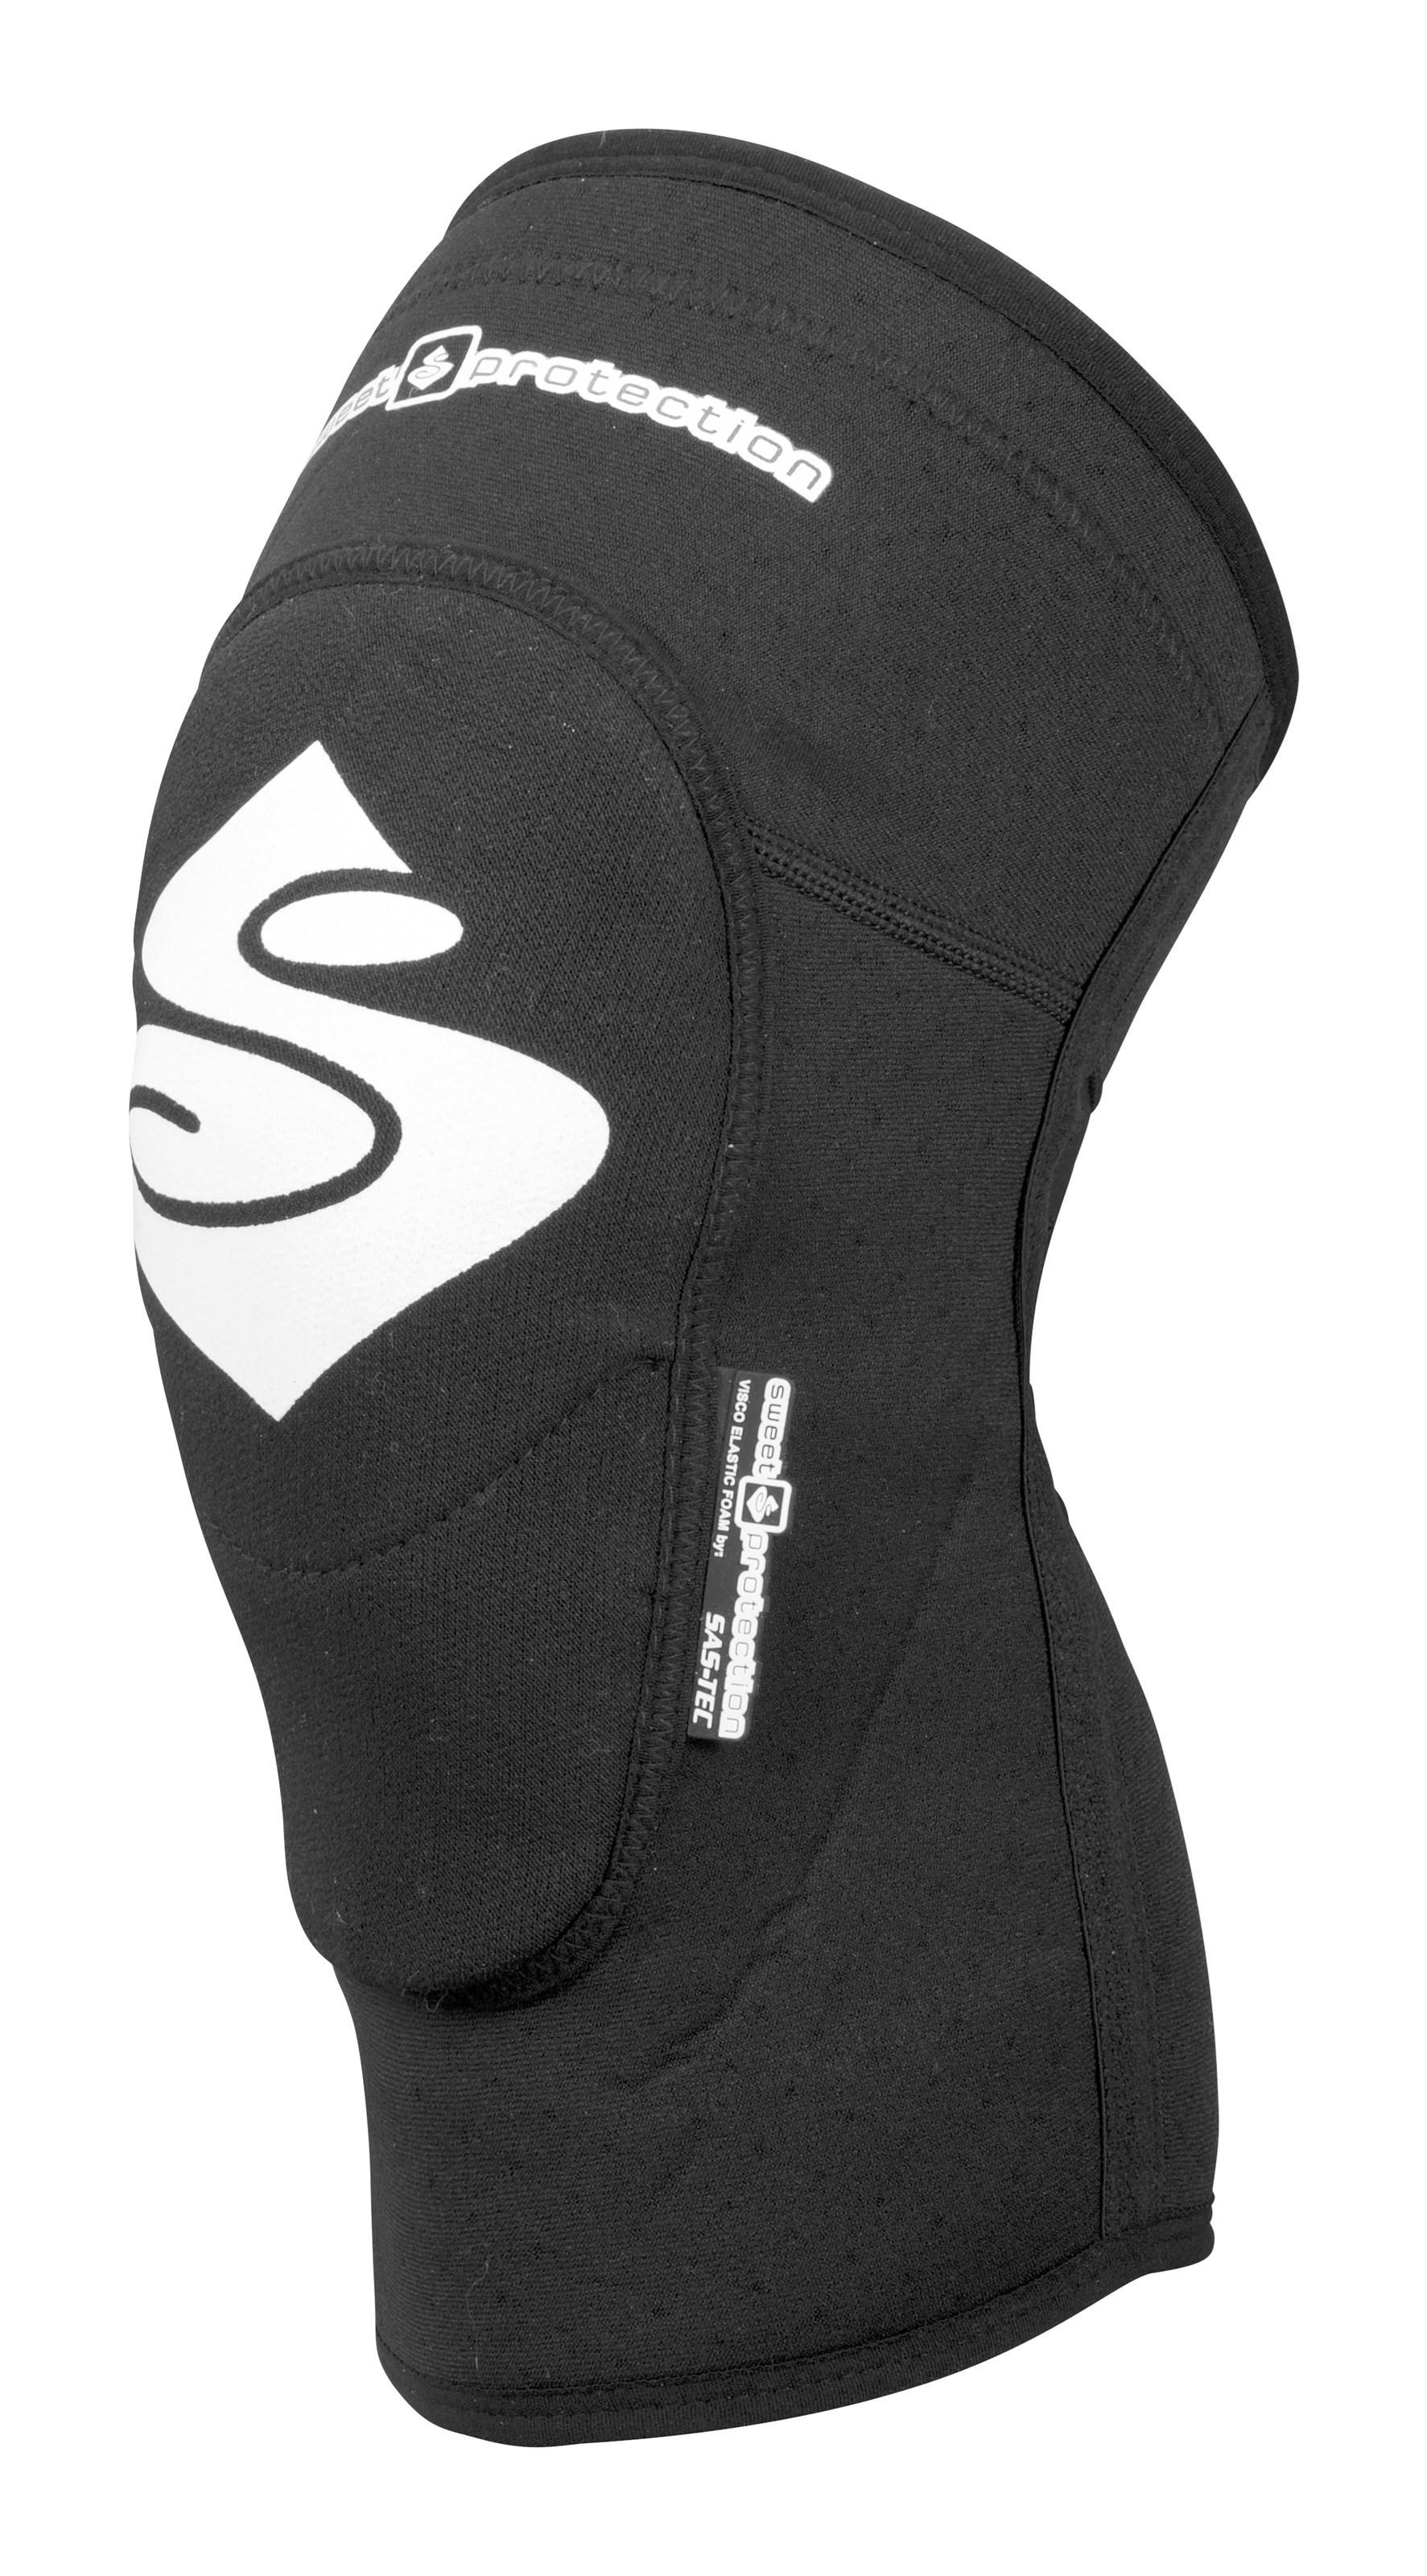 e4b852f29 Braasport - Sweet Protection Bearsuit Knee Guards Knebeskyttere, unisex